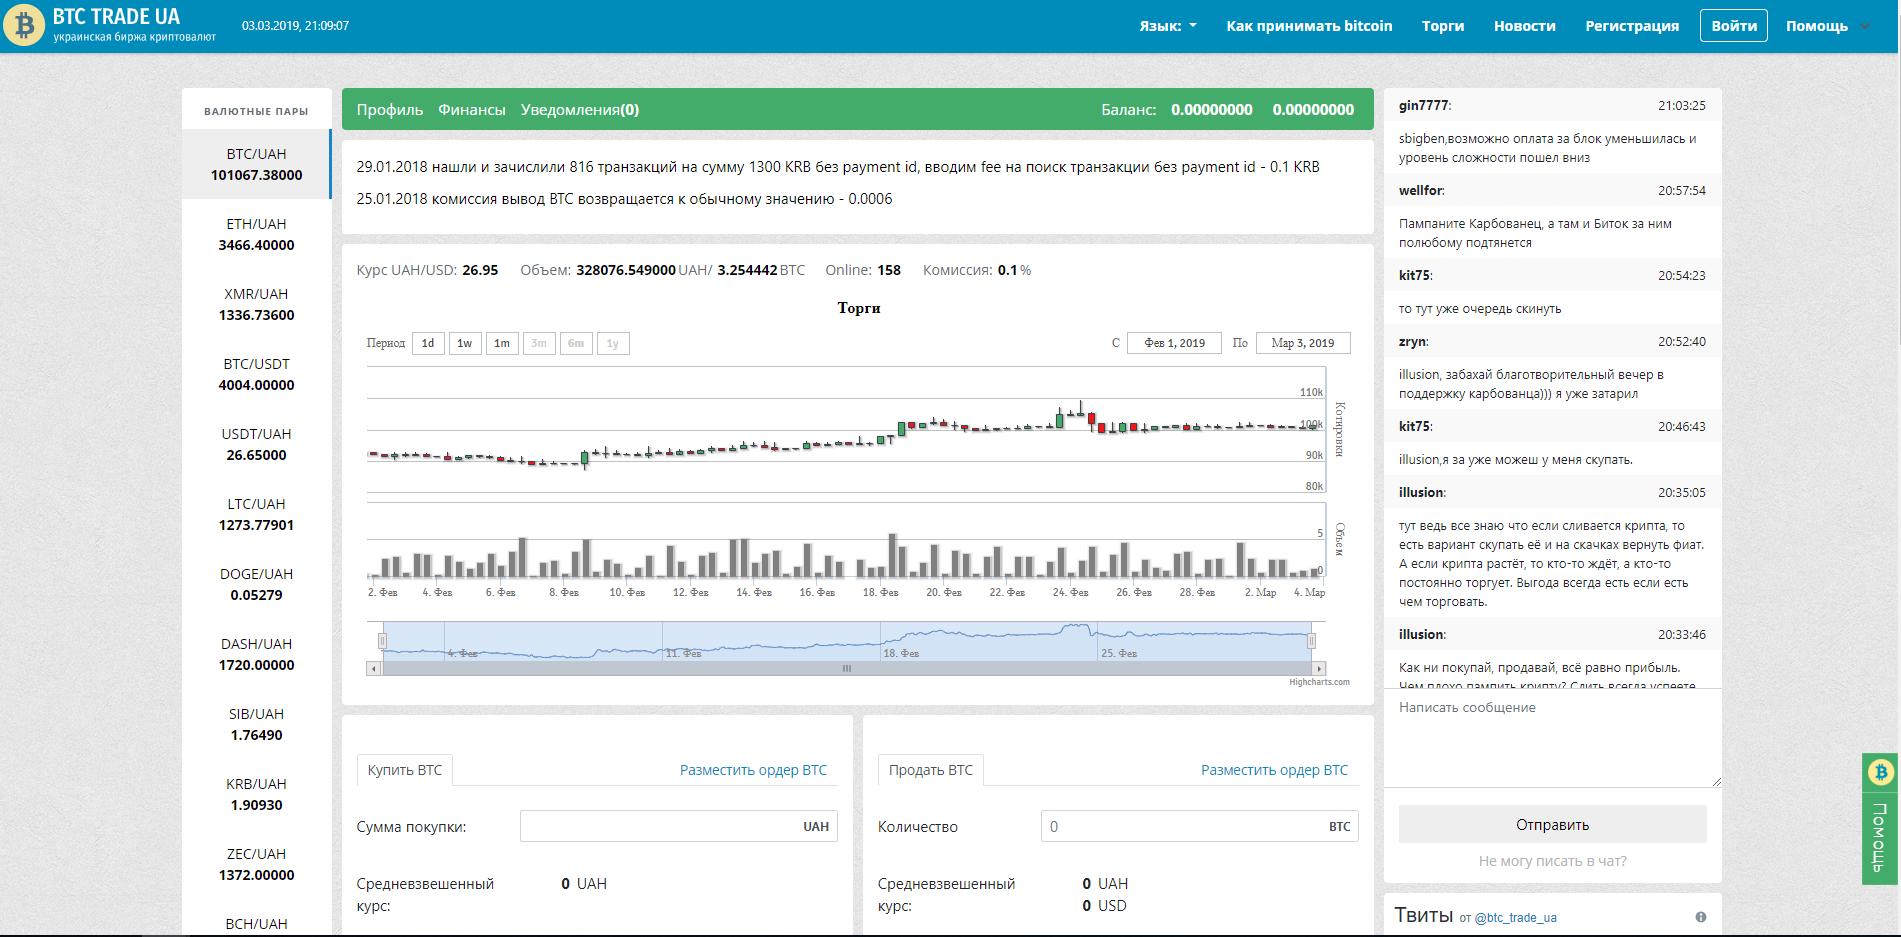 BTC Trade UA Exchange - Trading Volume, Stats & Info | Coinranking